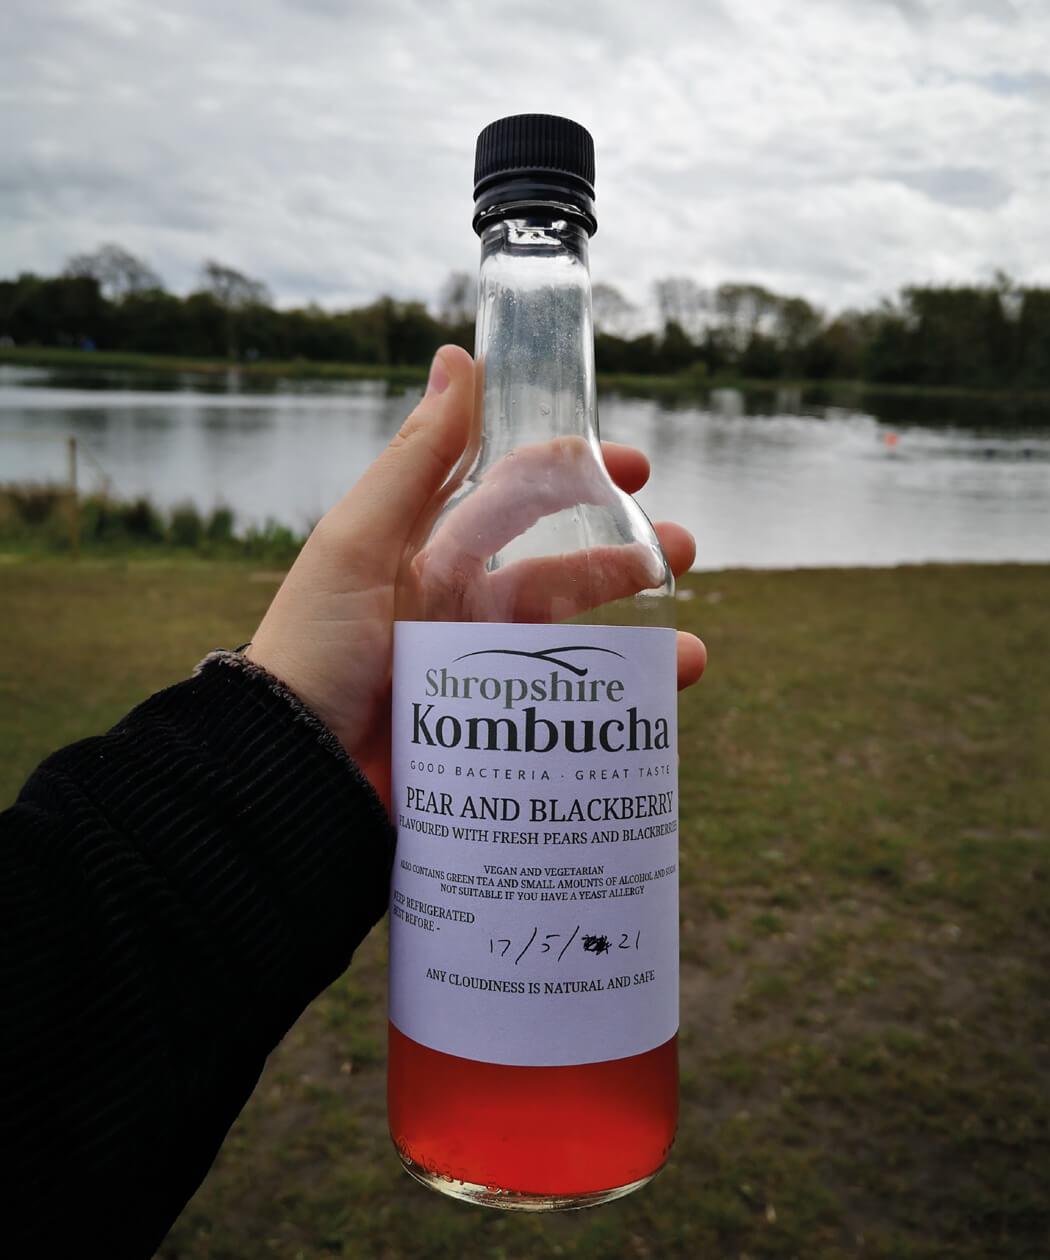 Bottle of Shropshire Kombucha